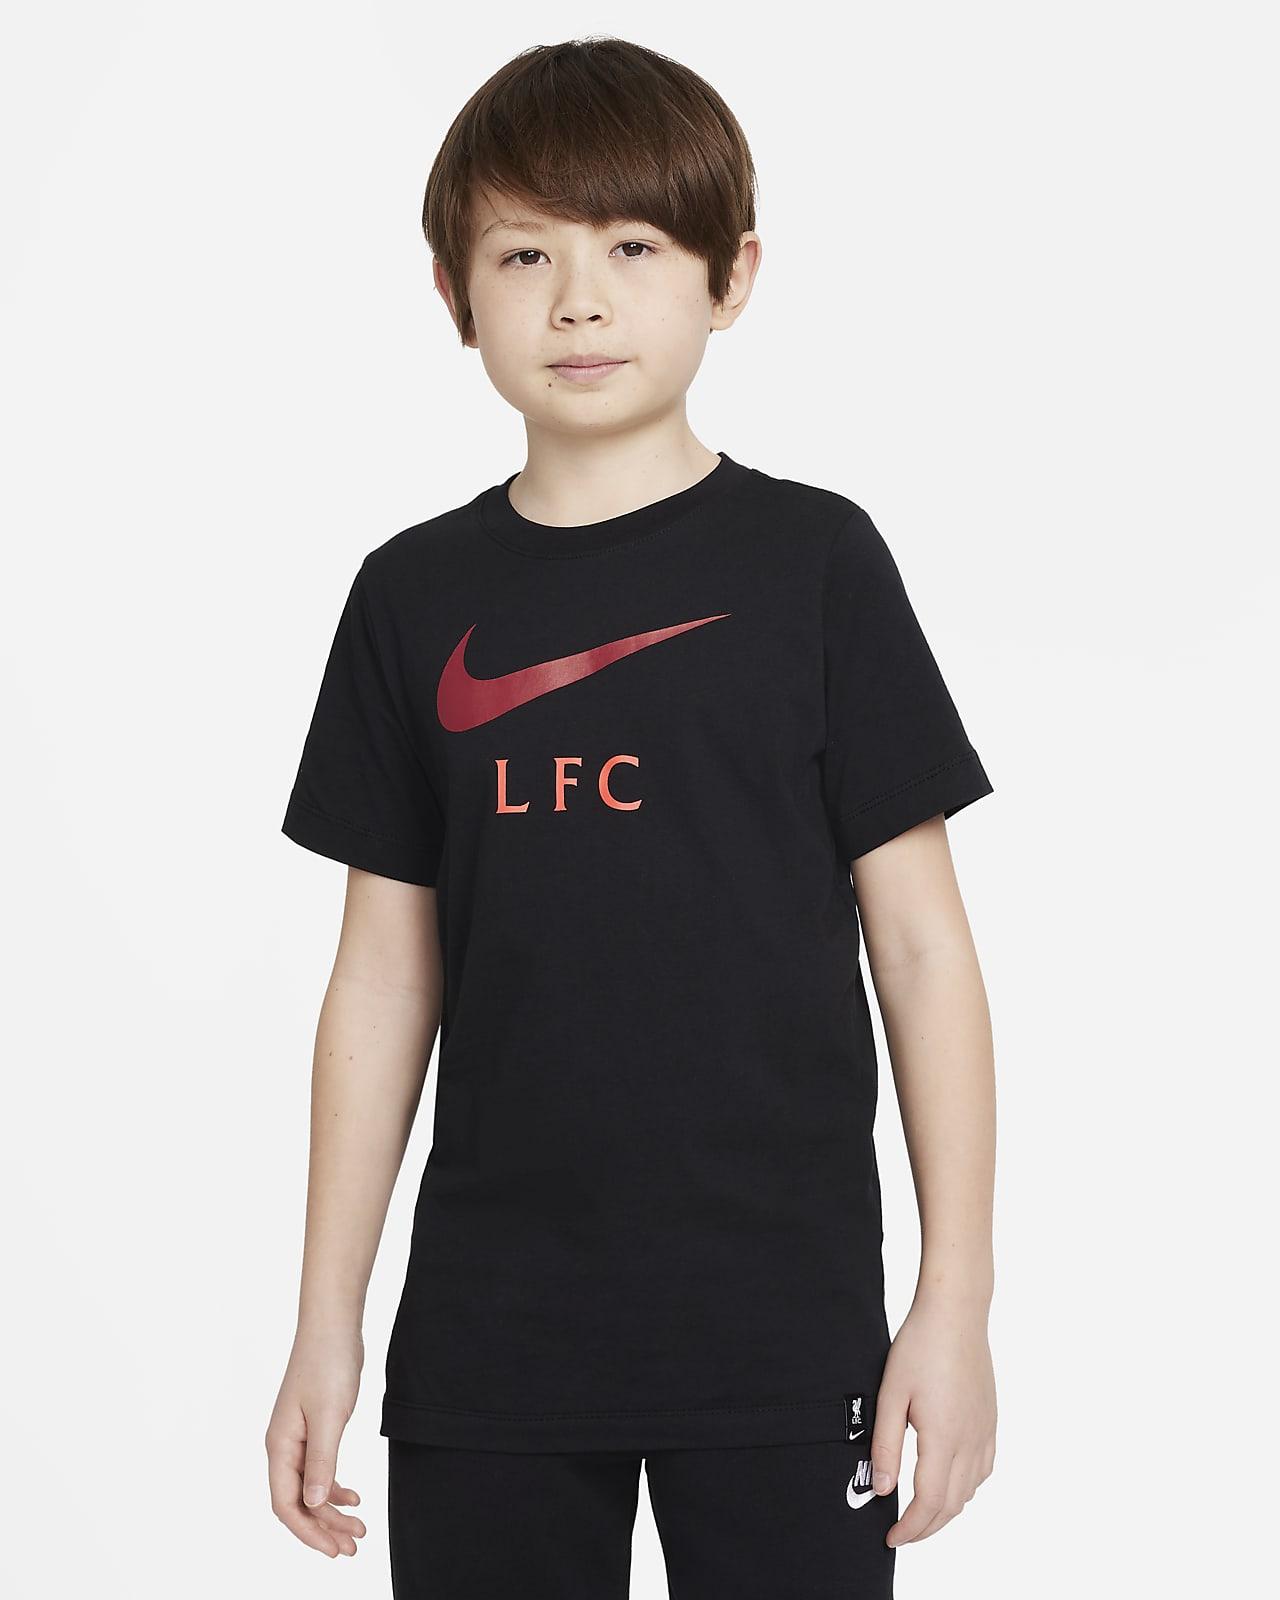 Cette Kid aime Liverpool Football Garçons Filles T SHIRT Âge 1-13